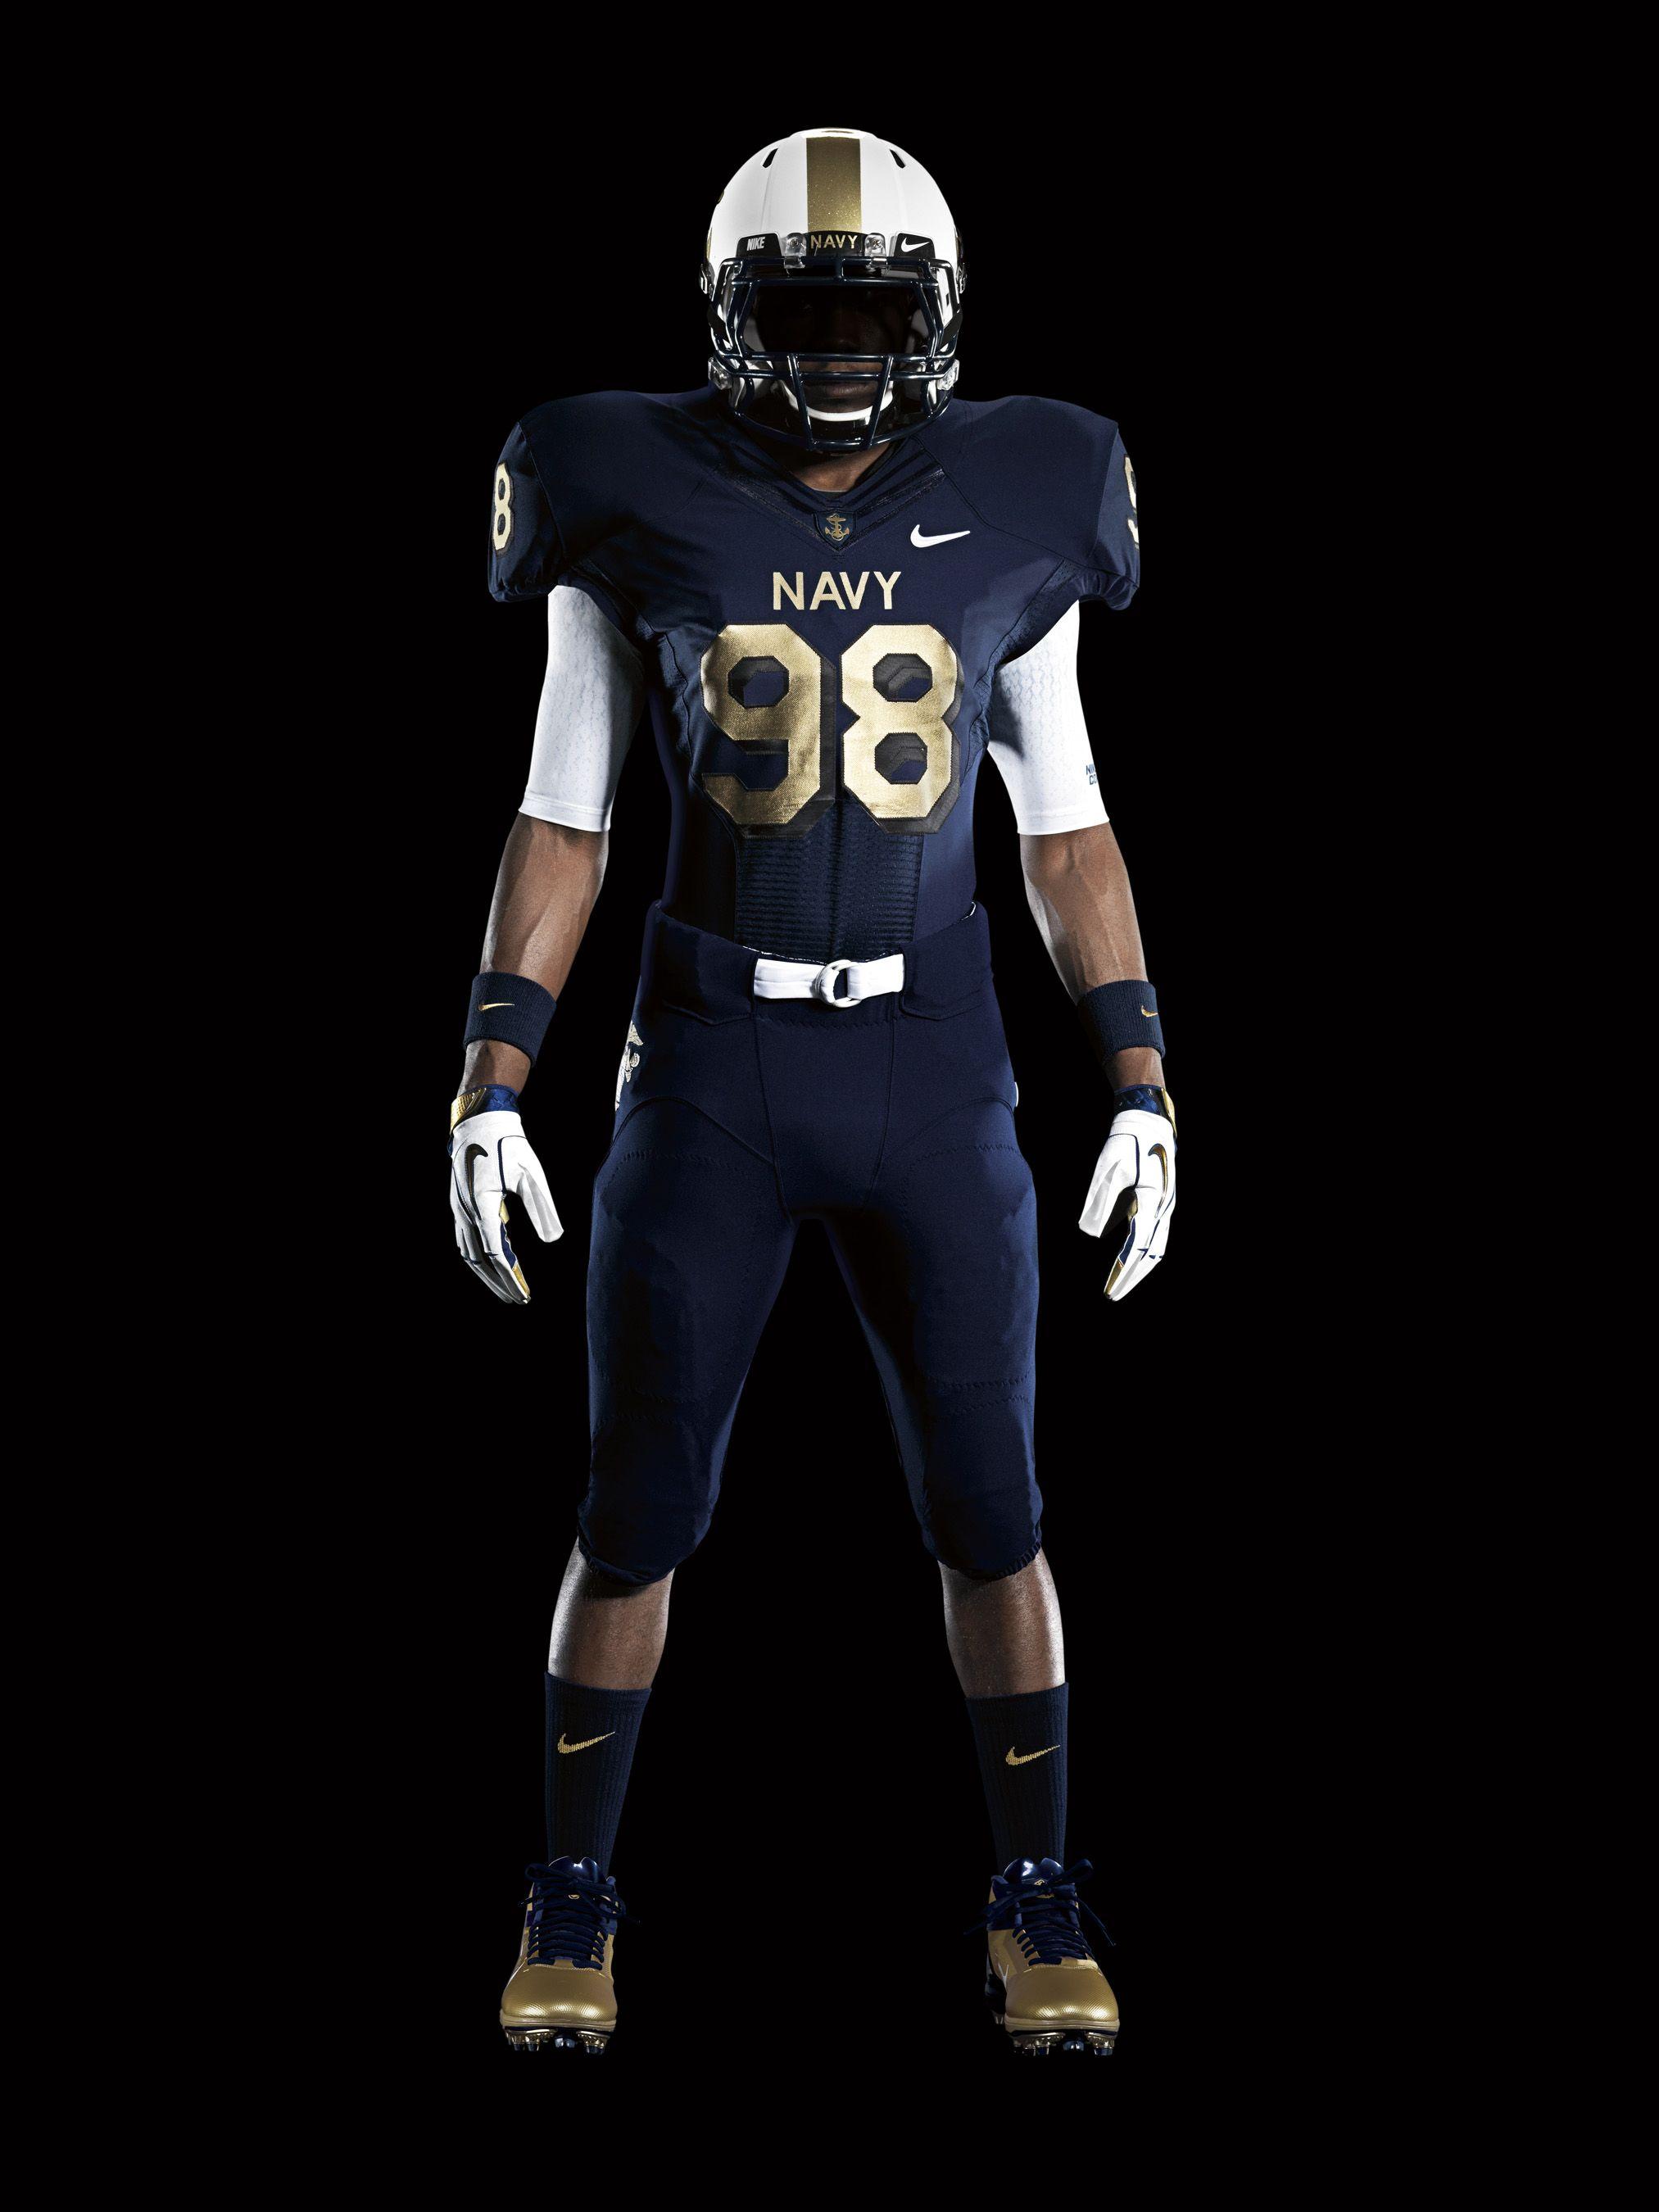 2011 Nike Pro Combat Uniform System Page 4 Football Outfits Army Vs Navy Football Navy Football